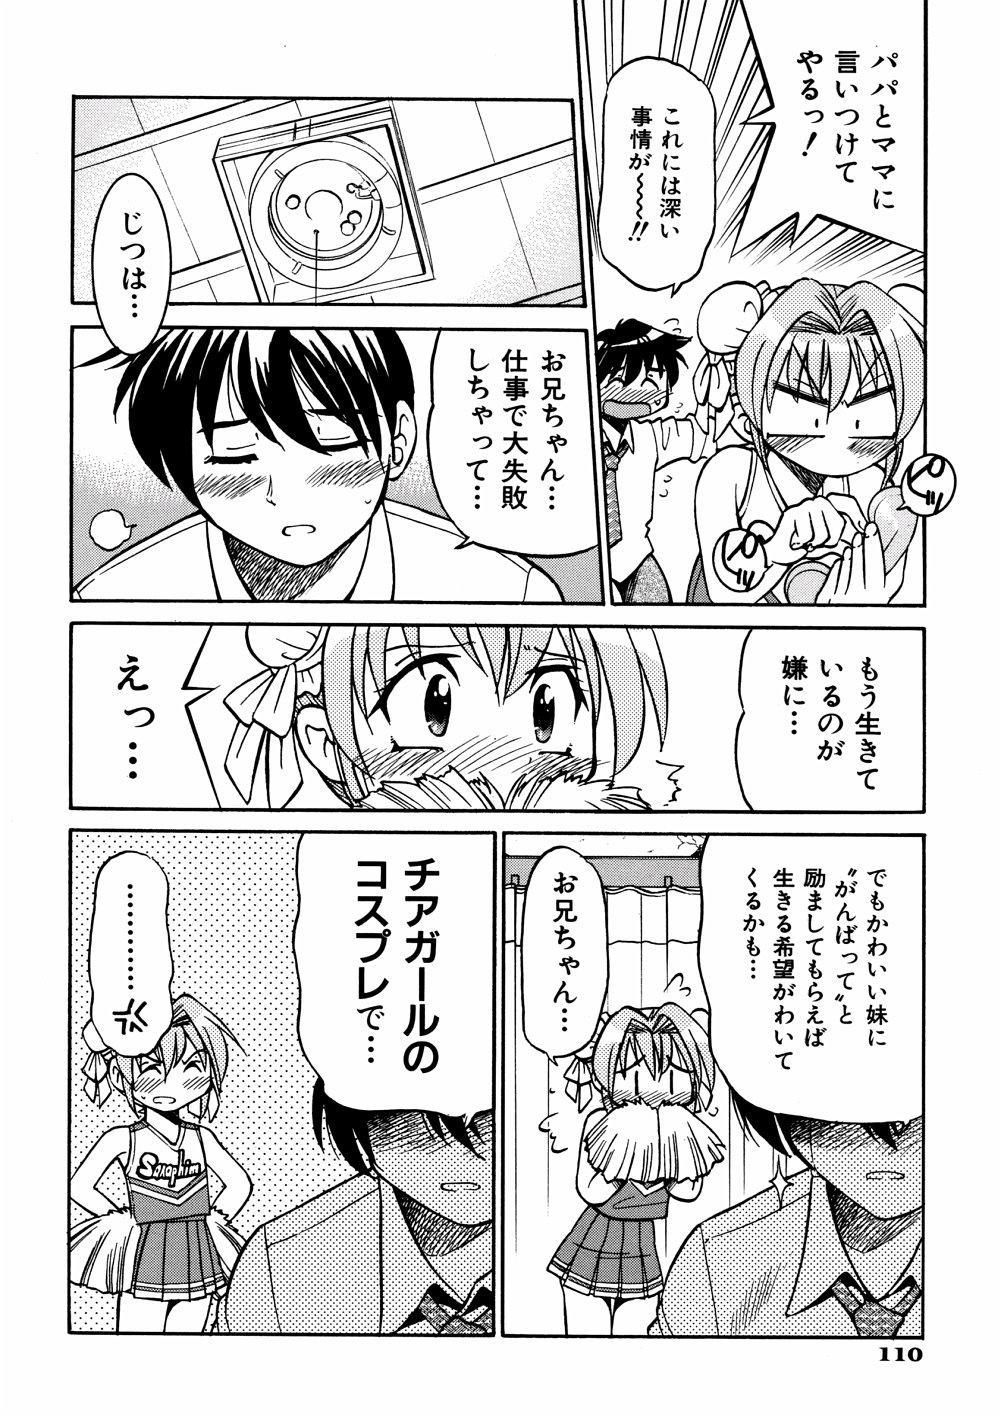 00 Nanako - Agent Nanako 112